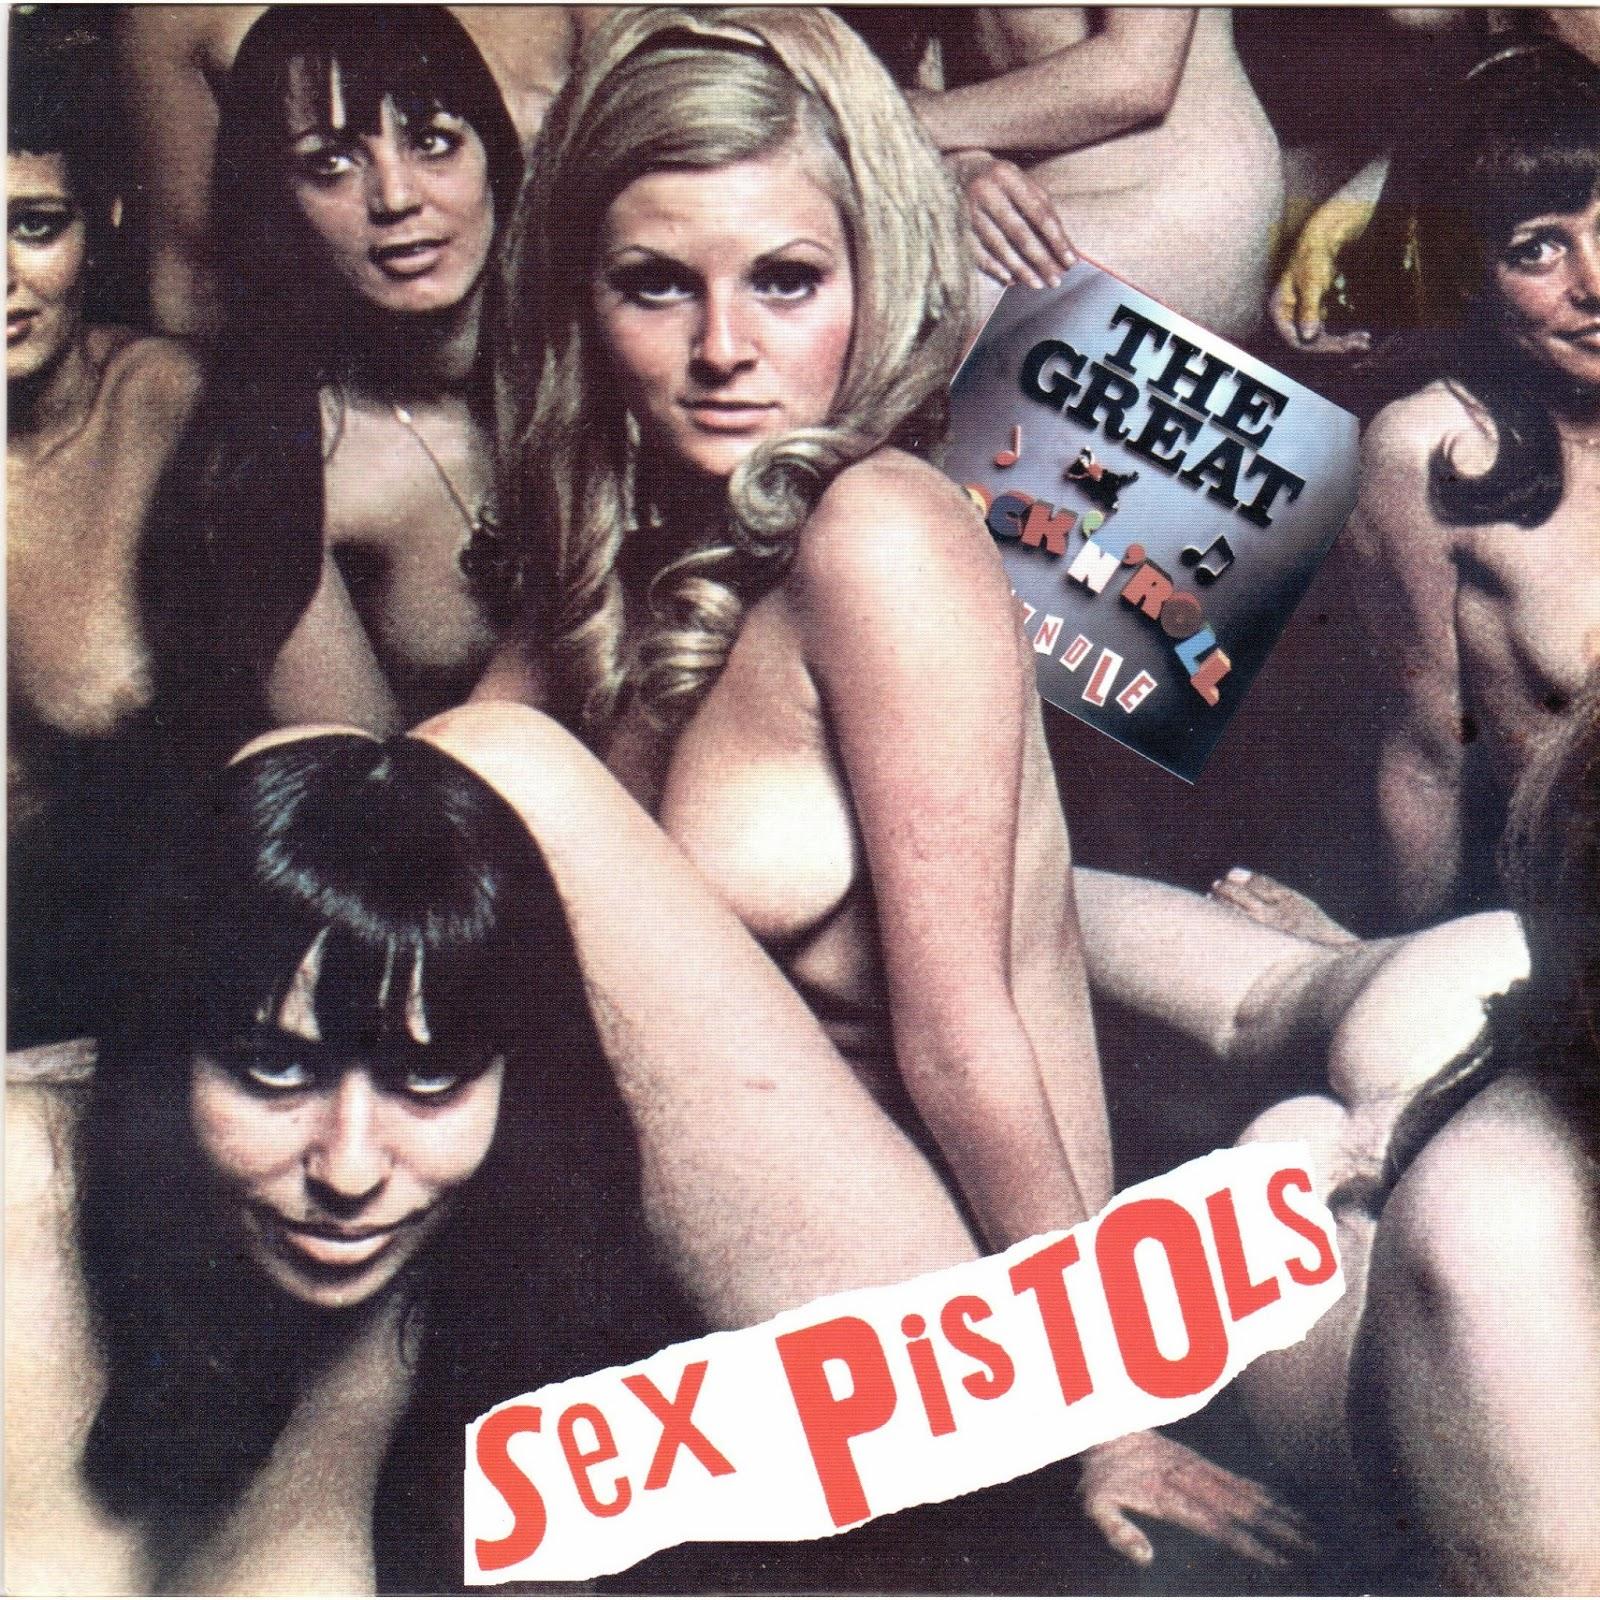 seks-pistols-foto